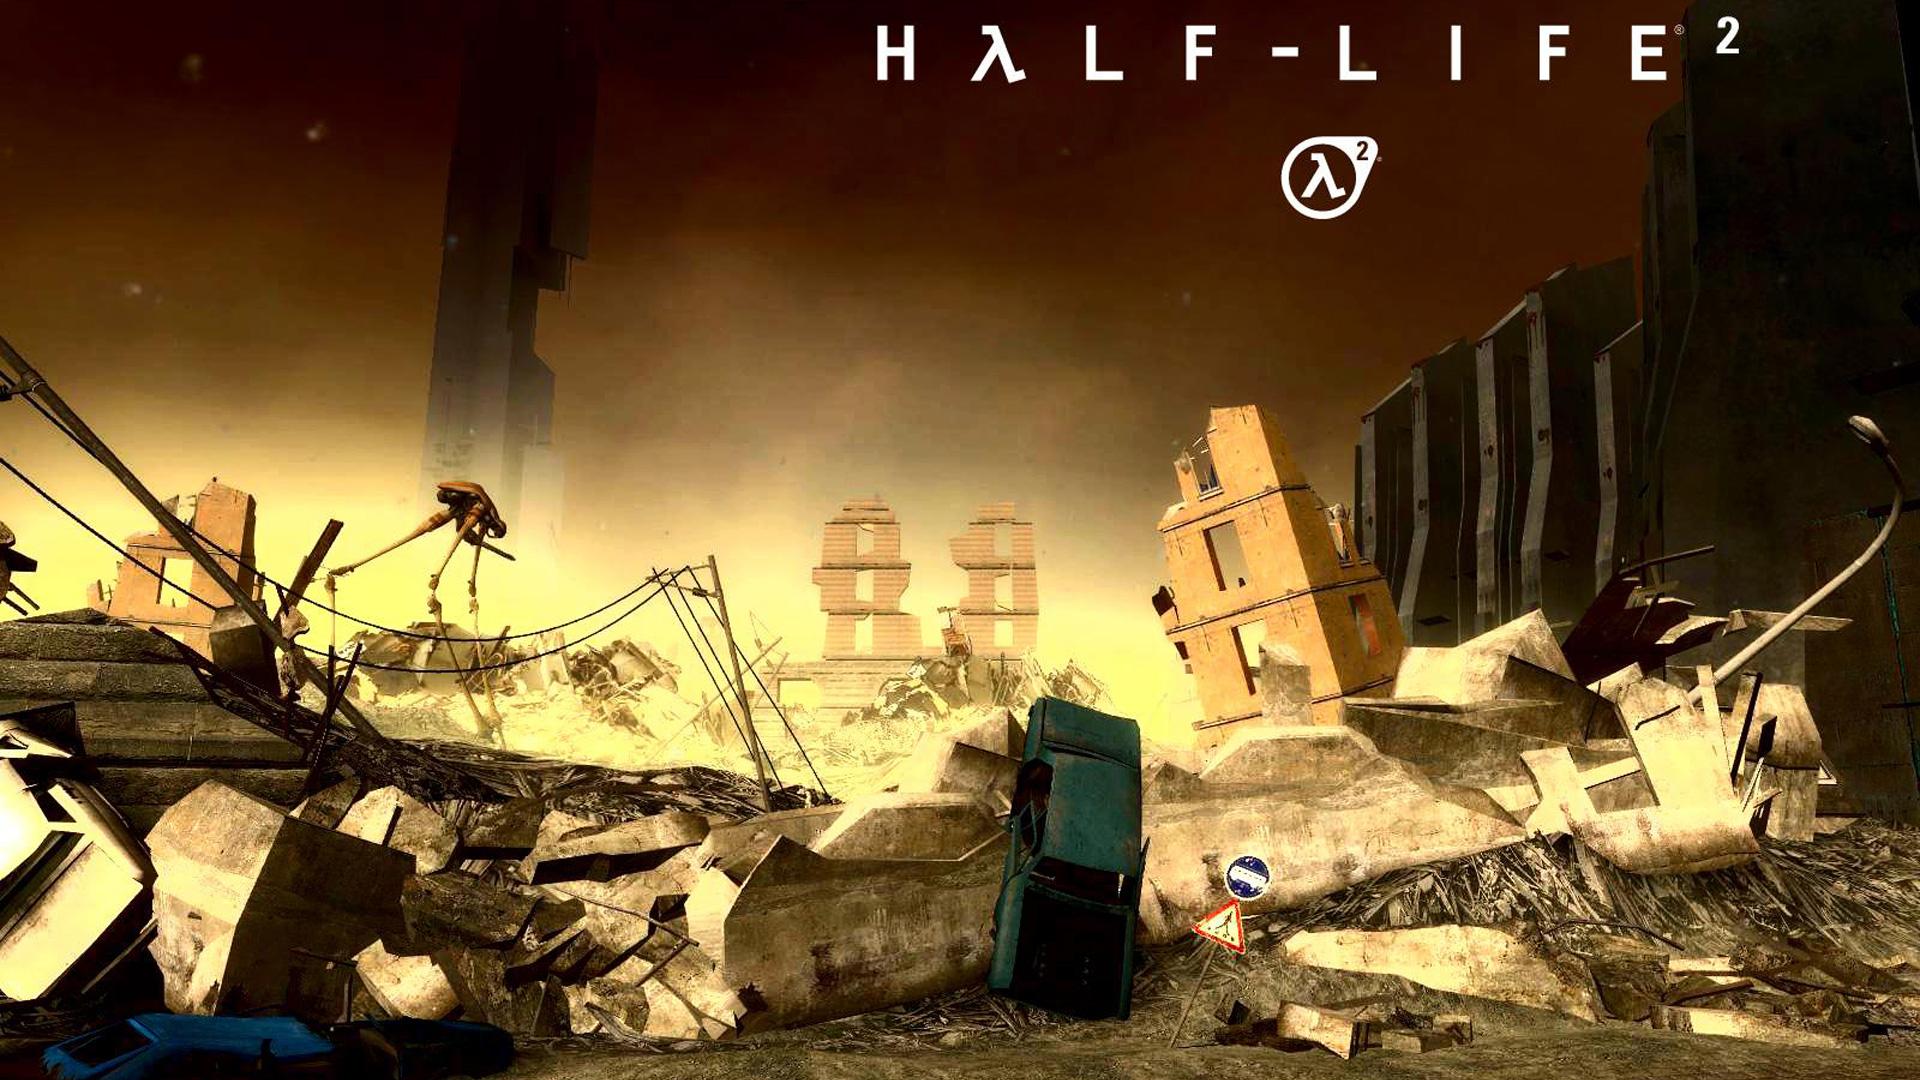 Free Half-Life 2 Wallpaper in 1920x1080